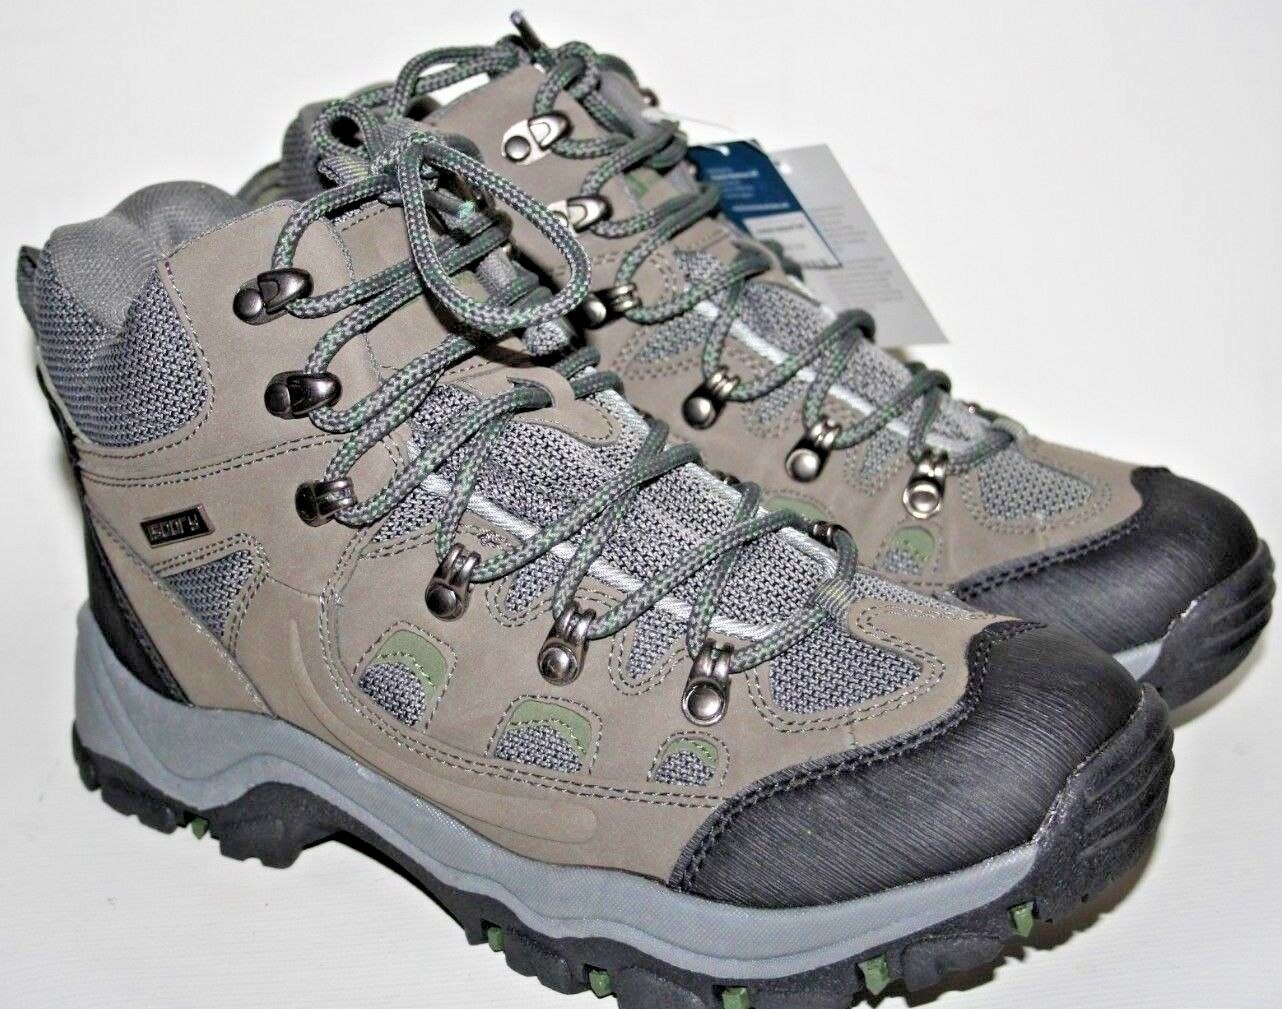 NEW Mountain Warehouse Isodry Waterproof Trekking Boots size UK 7 EU 41 Grey